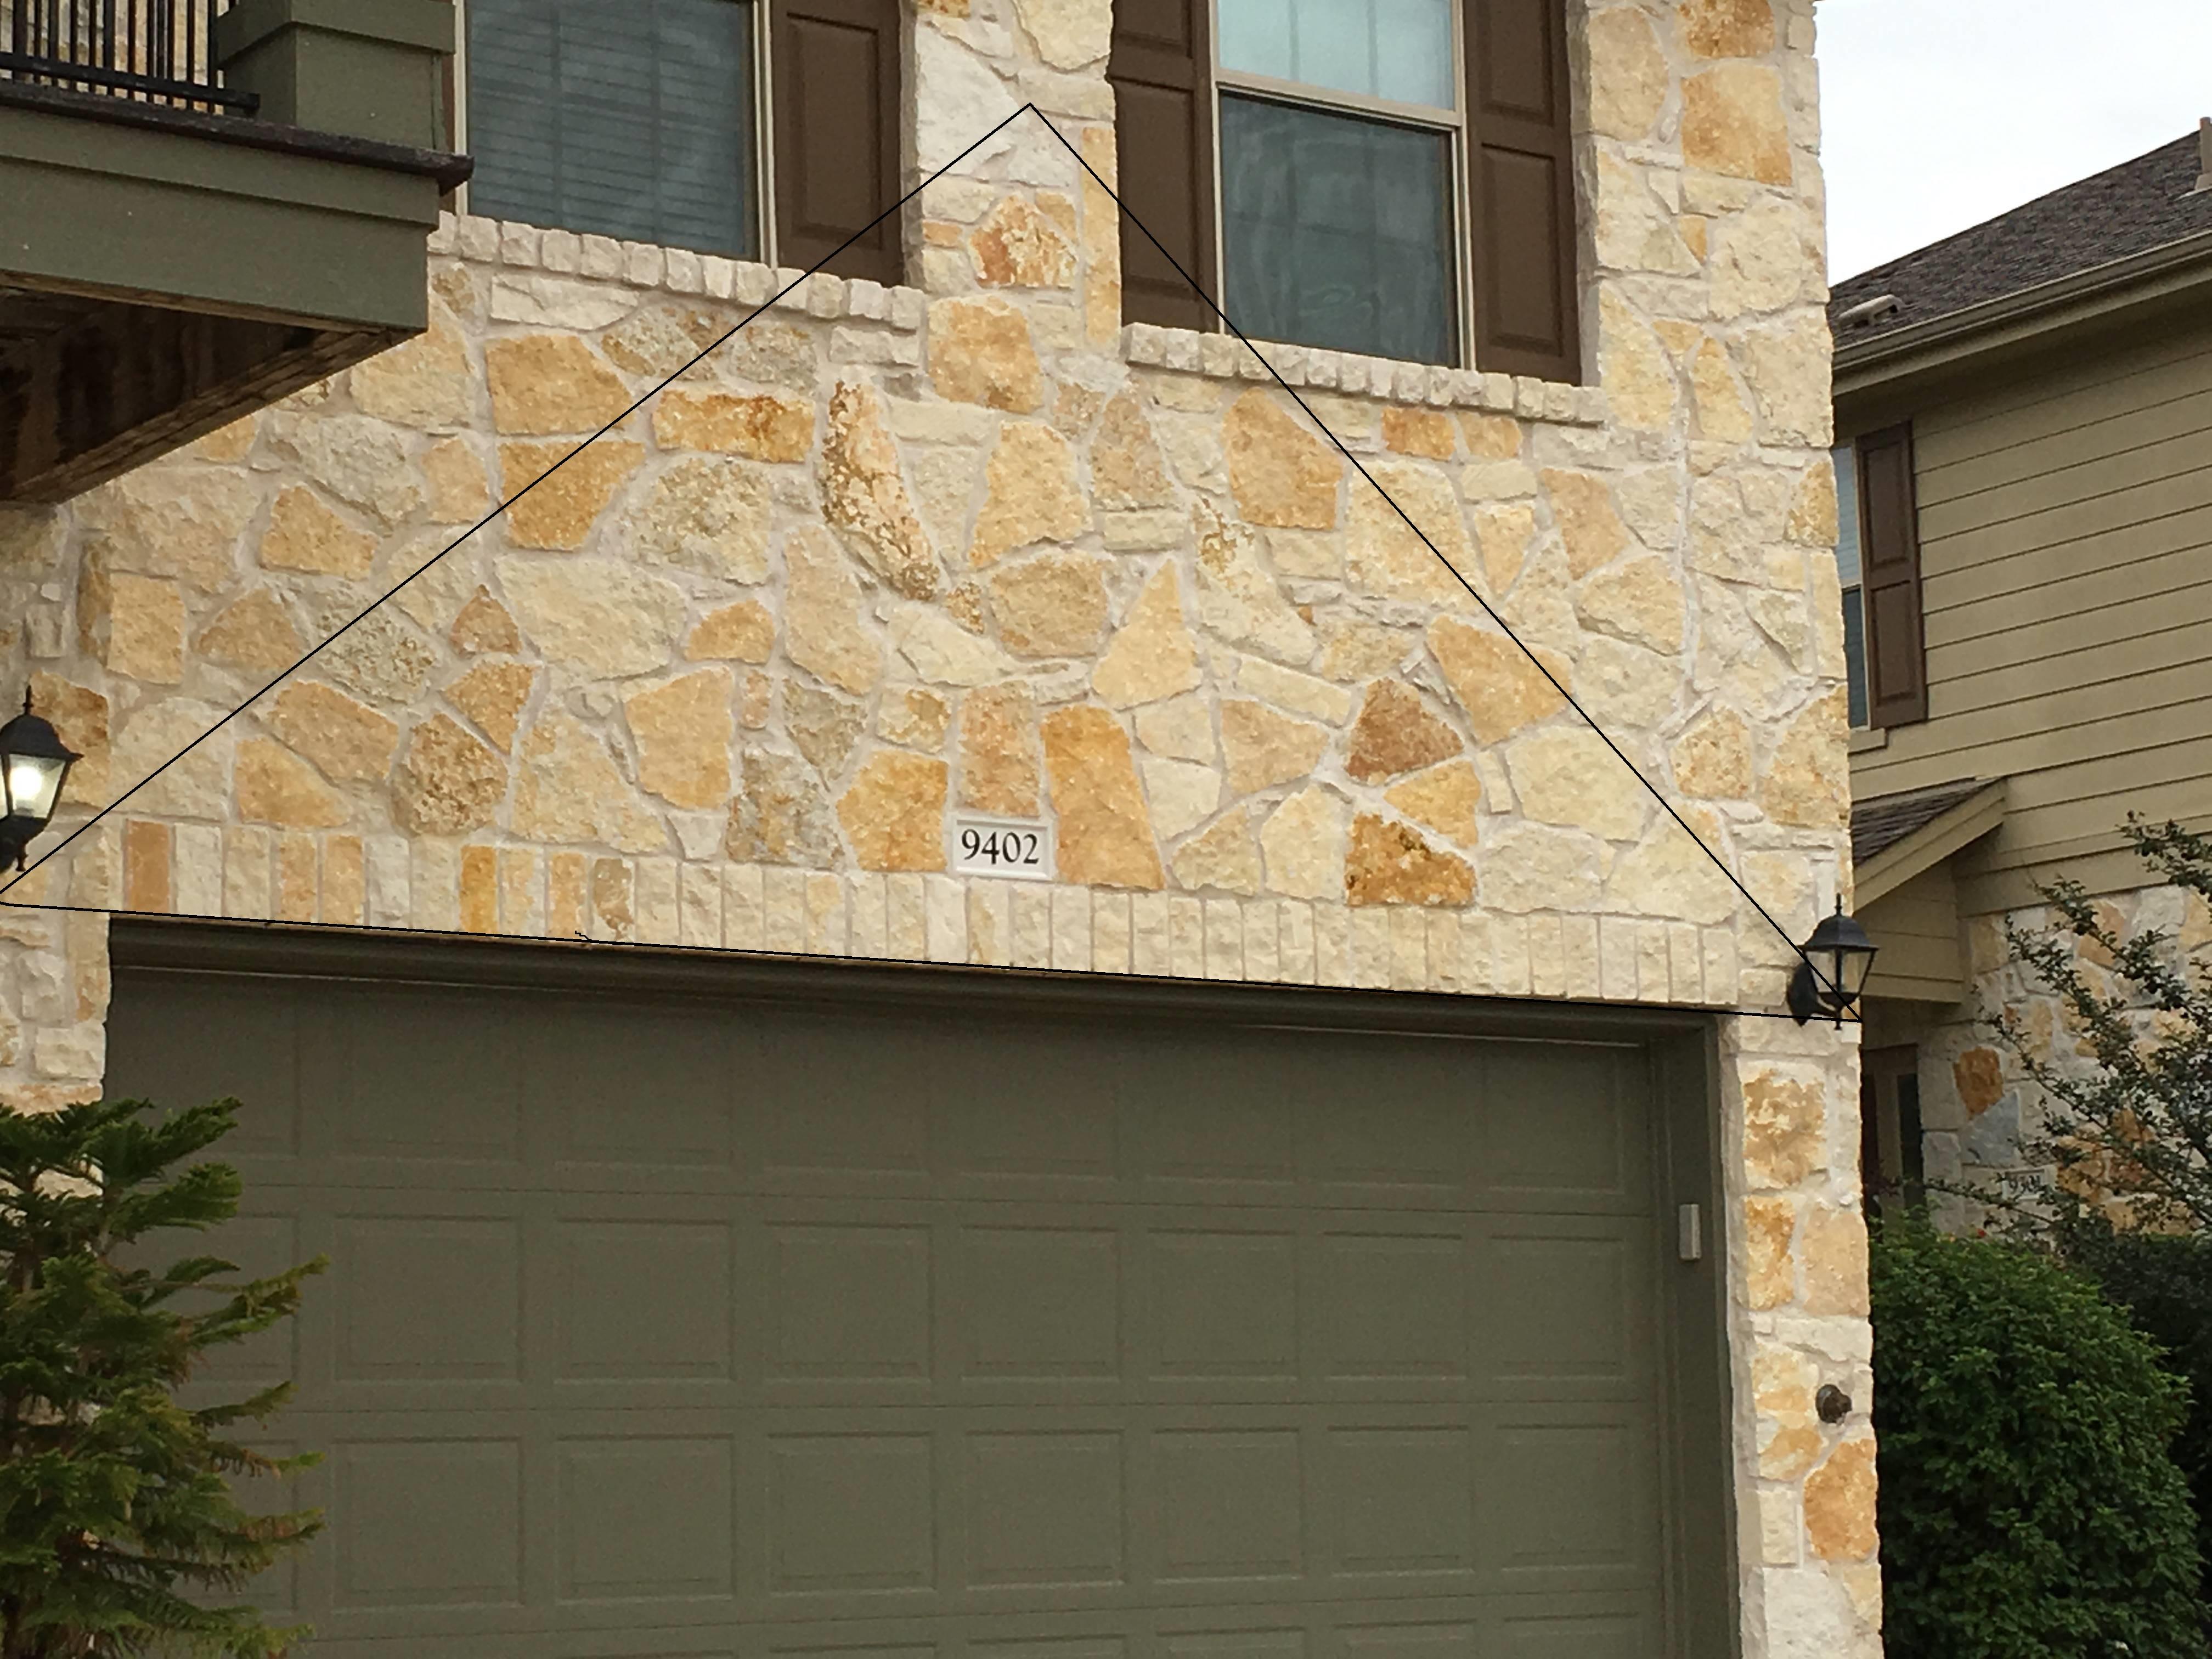 Changing Out Existing Garage Door Lintel in Natural Stone Wall-ziiekkbrev1.jpg